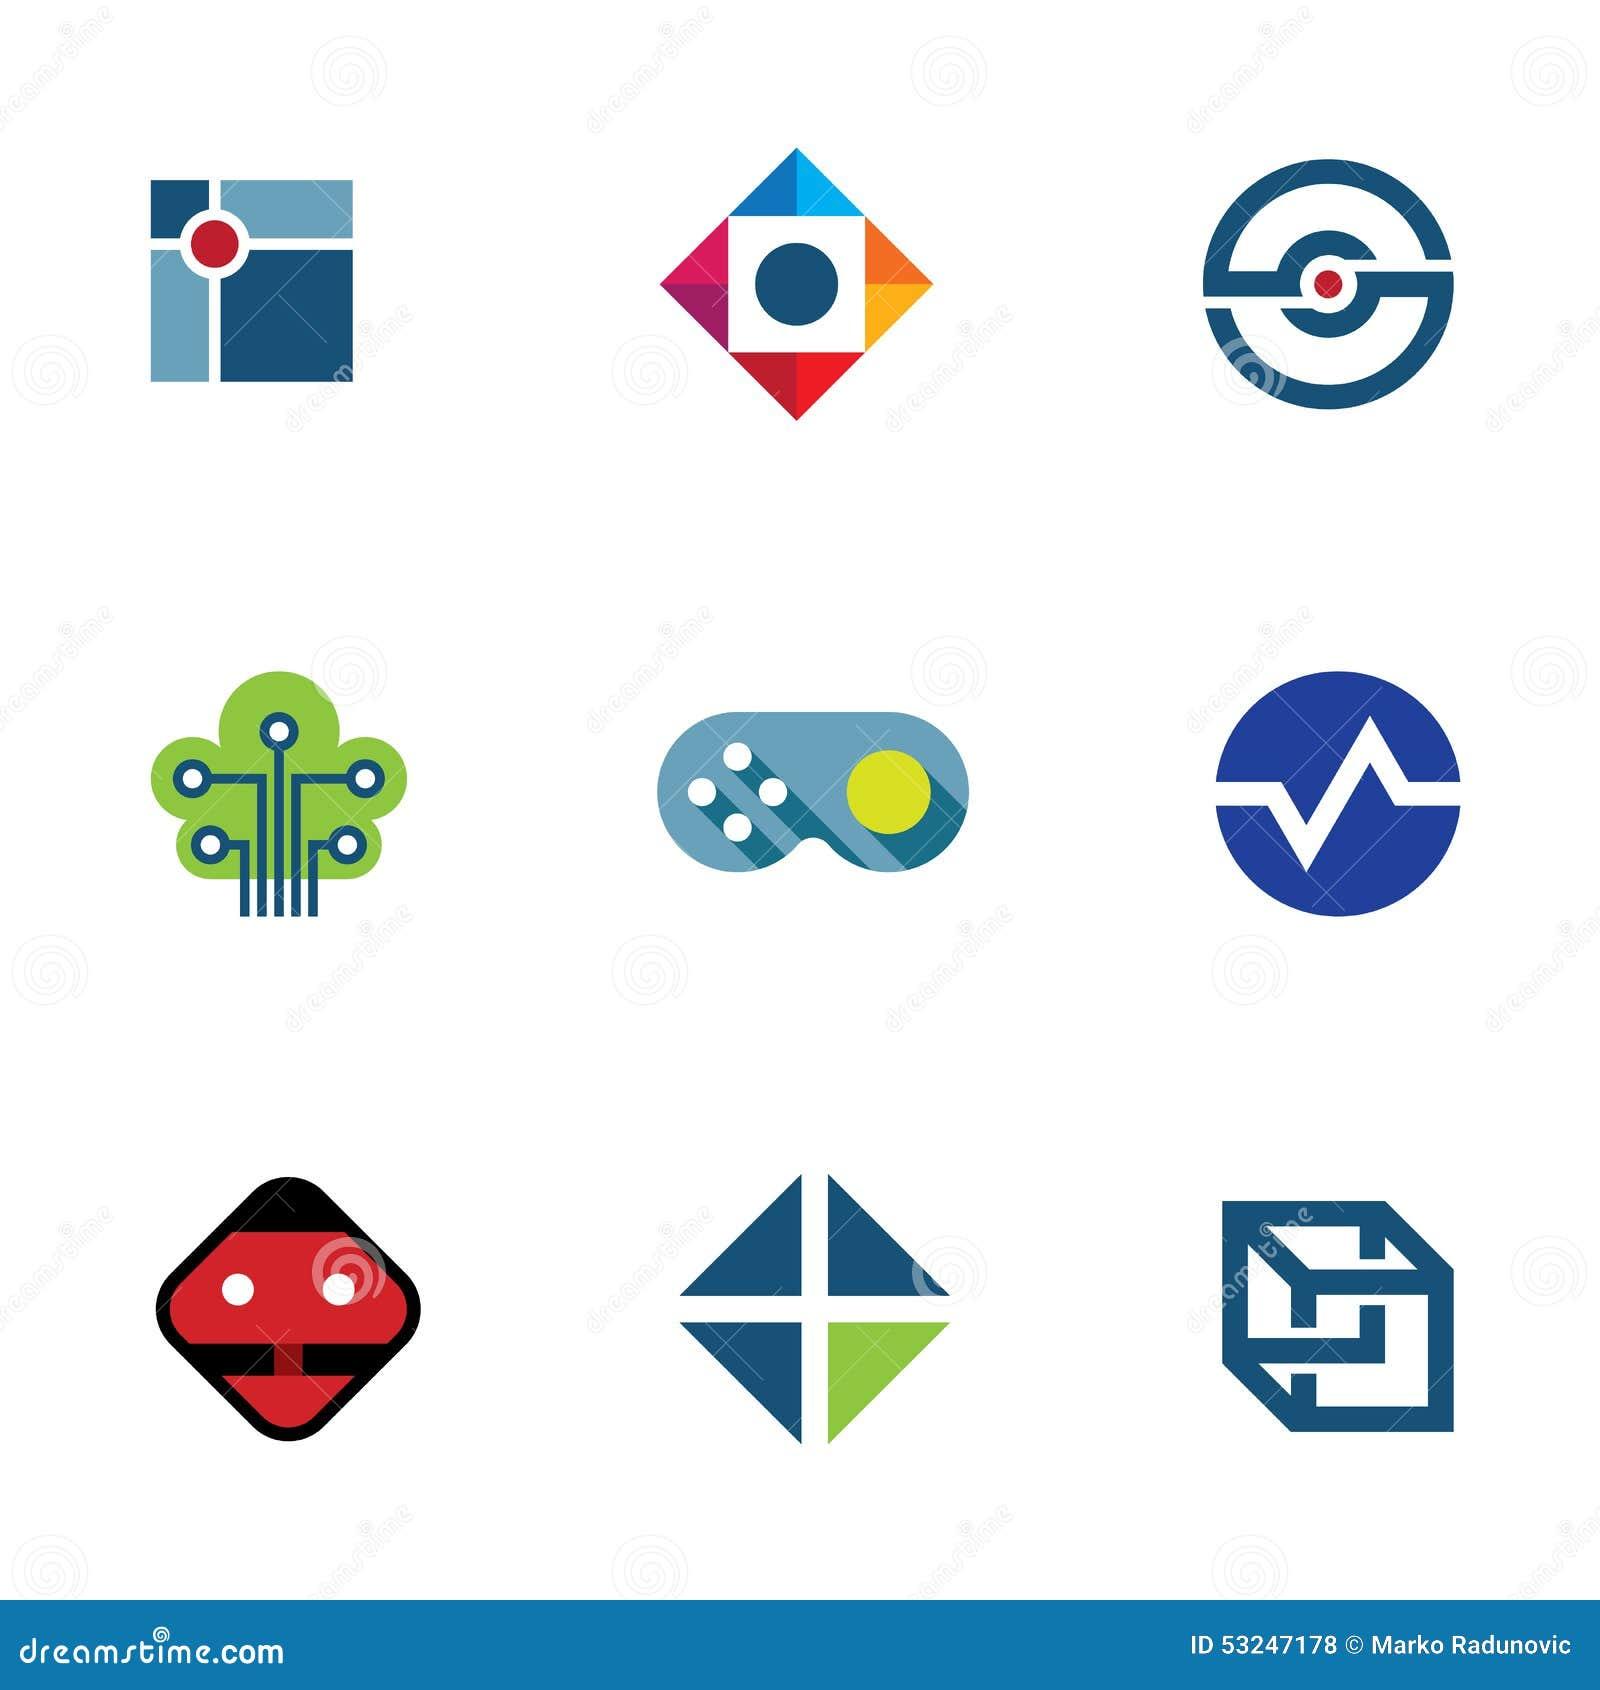 ... Professional Fun Ideas Logo Icon Stock Illustration - Image: 53247178